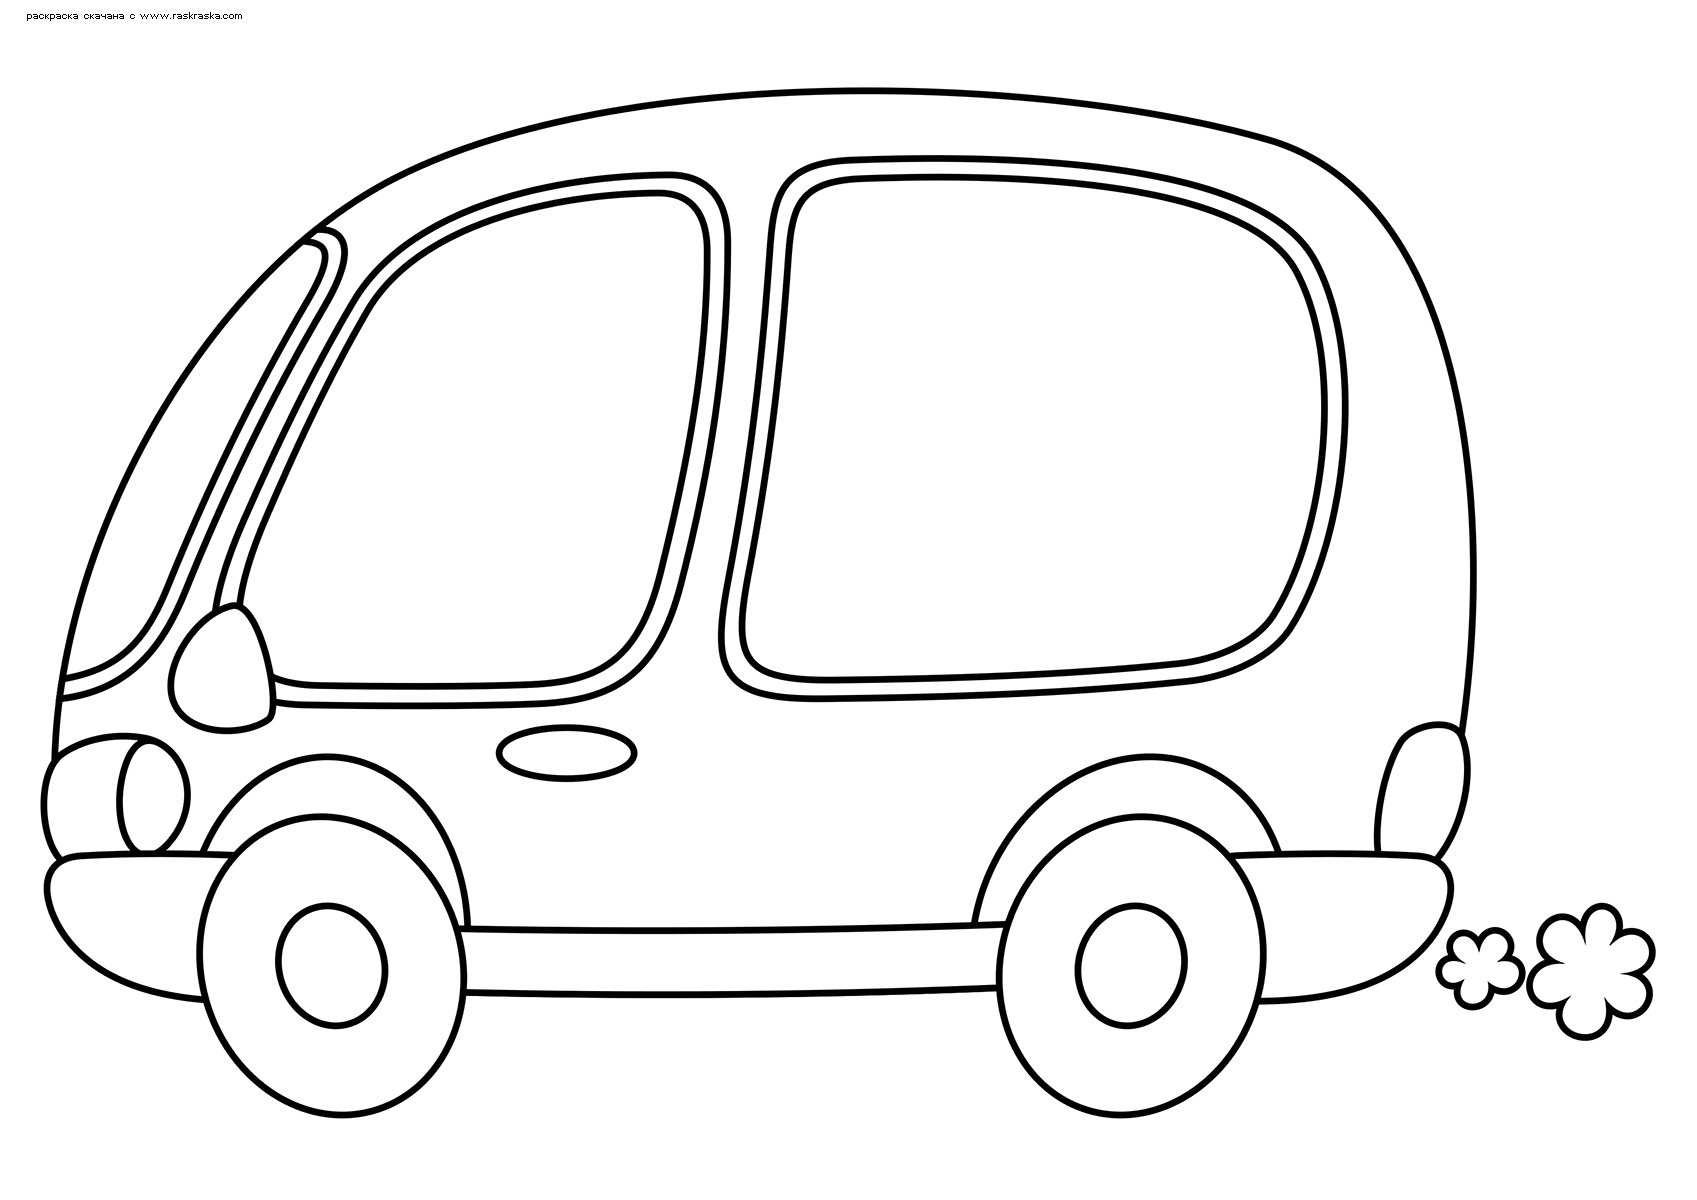 Раскраска Микроавтобус. Раскраска автобус